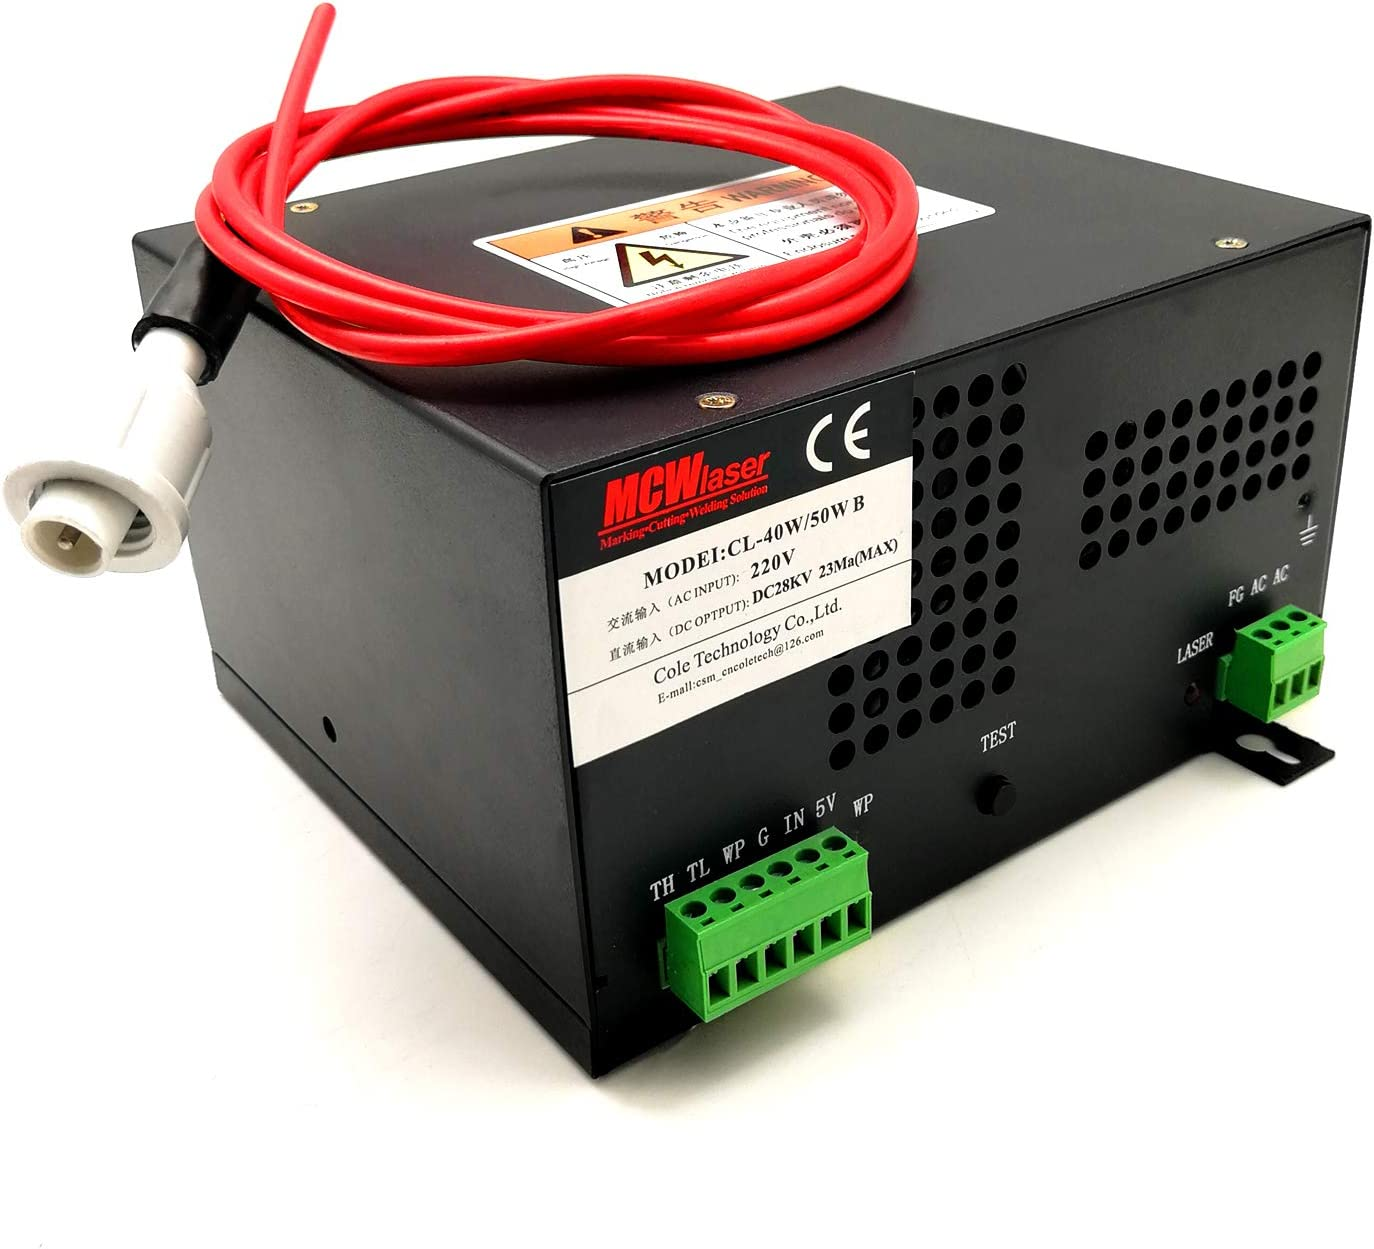 HQ MCWlaser 80W CO2 Laser Power Supply for CO2 laser Engraver Cutter AC 110V